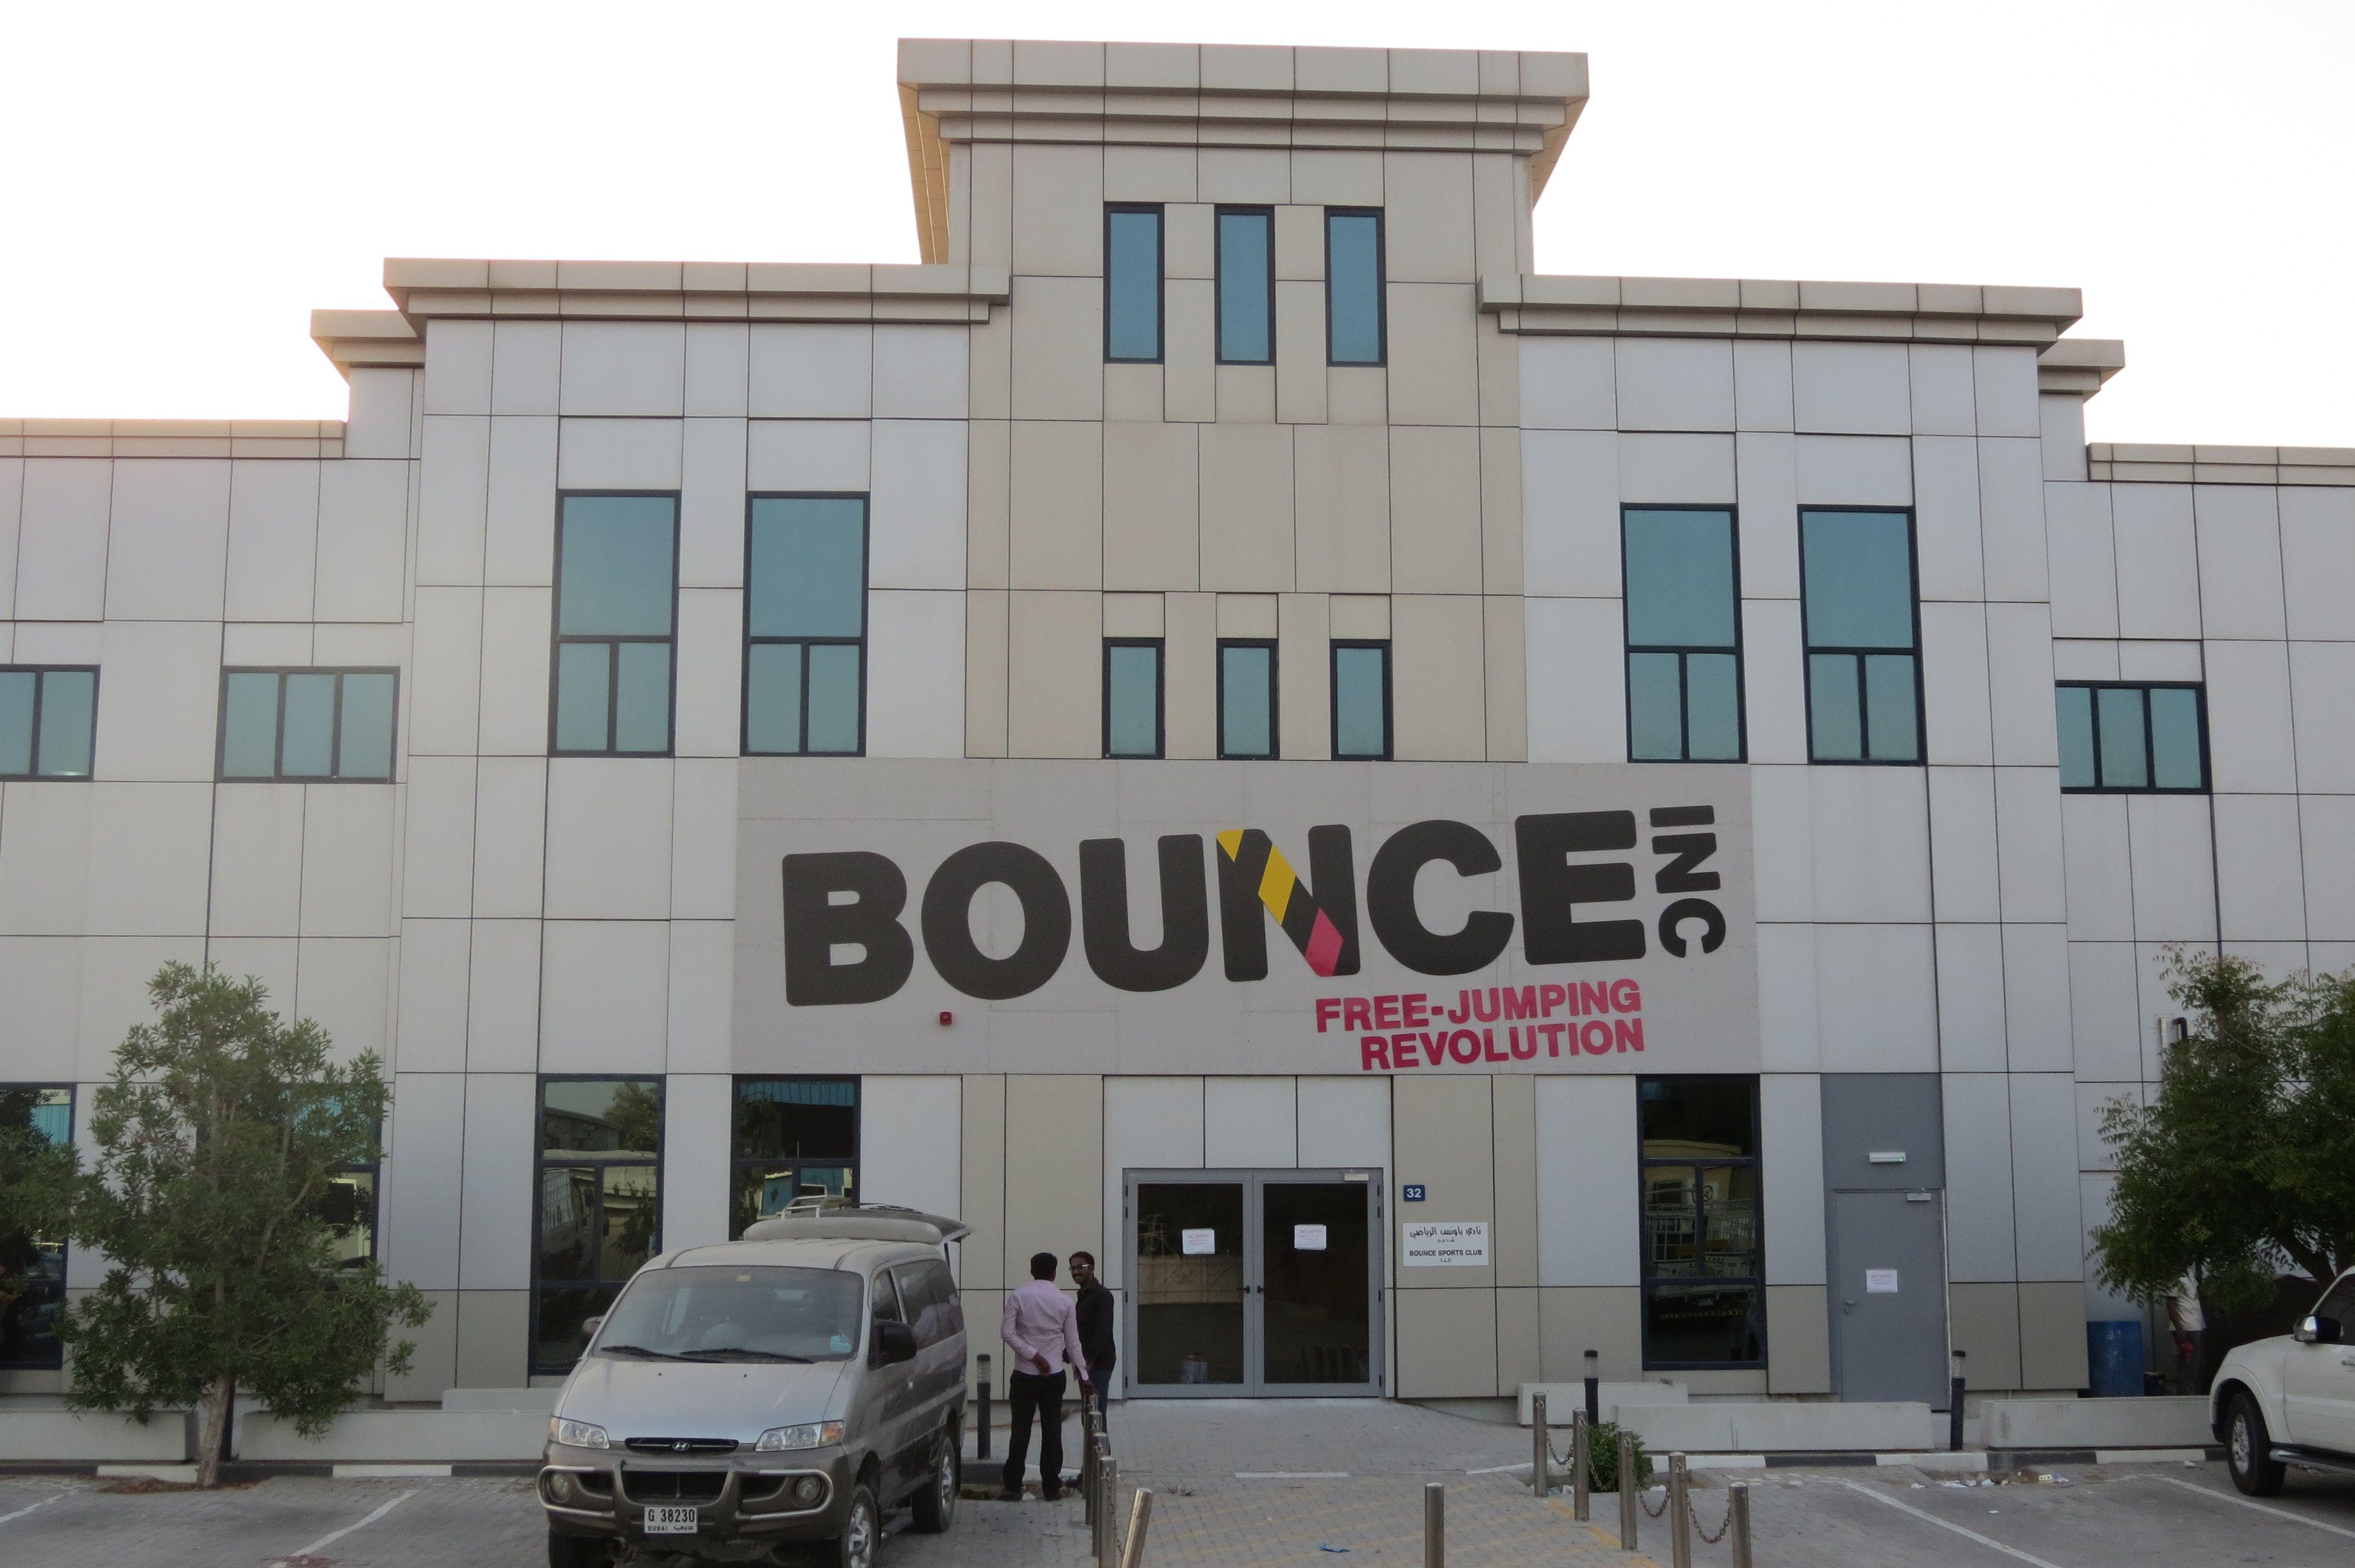 #bounce - Dubai Logo sign by Adwaasign center